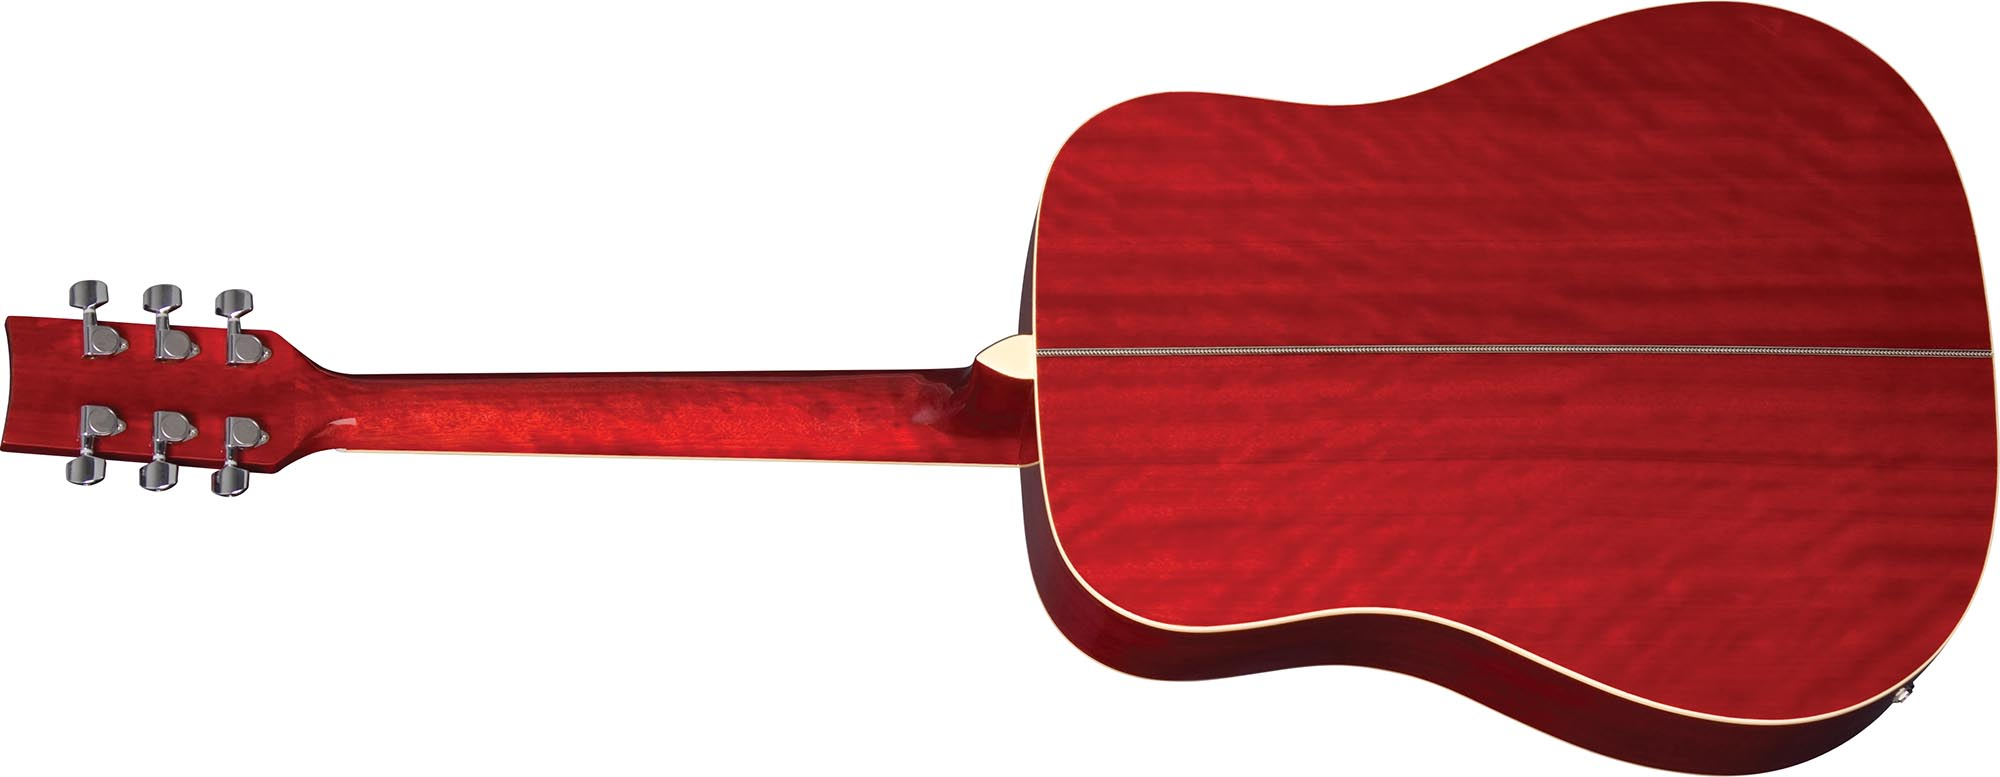 ch887 violao folk dreadnought eagle pro series ch887 rds vermelho sunburst visao posterior